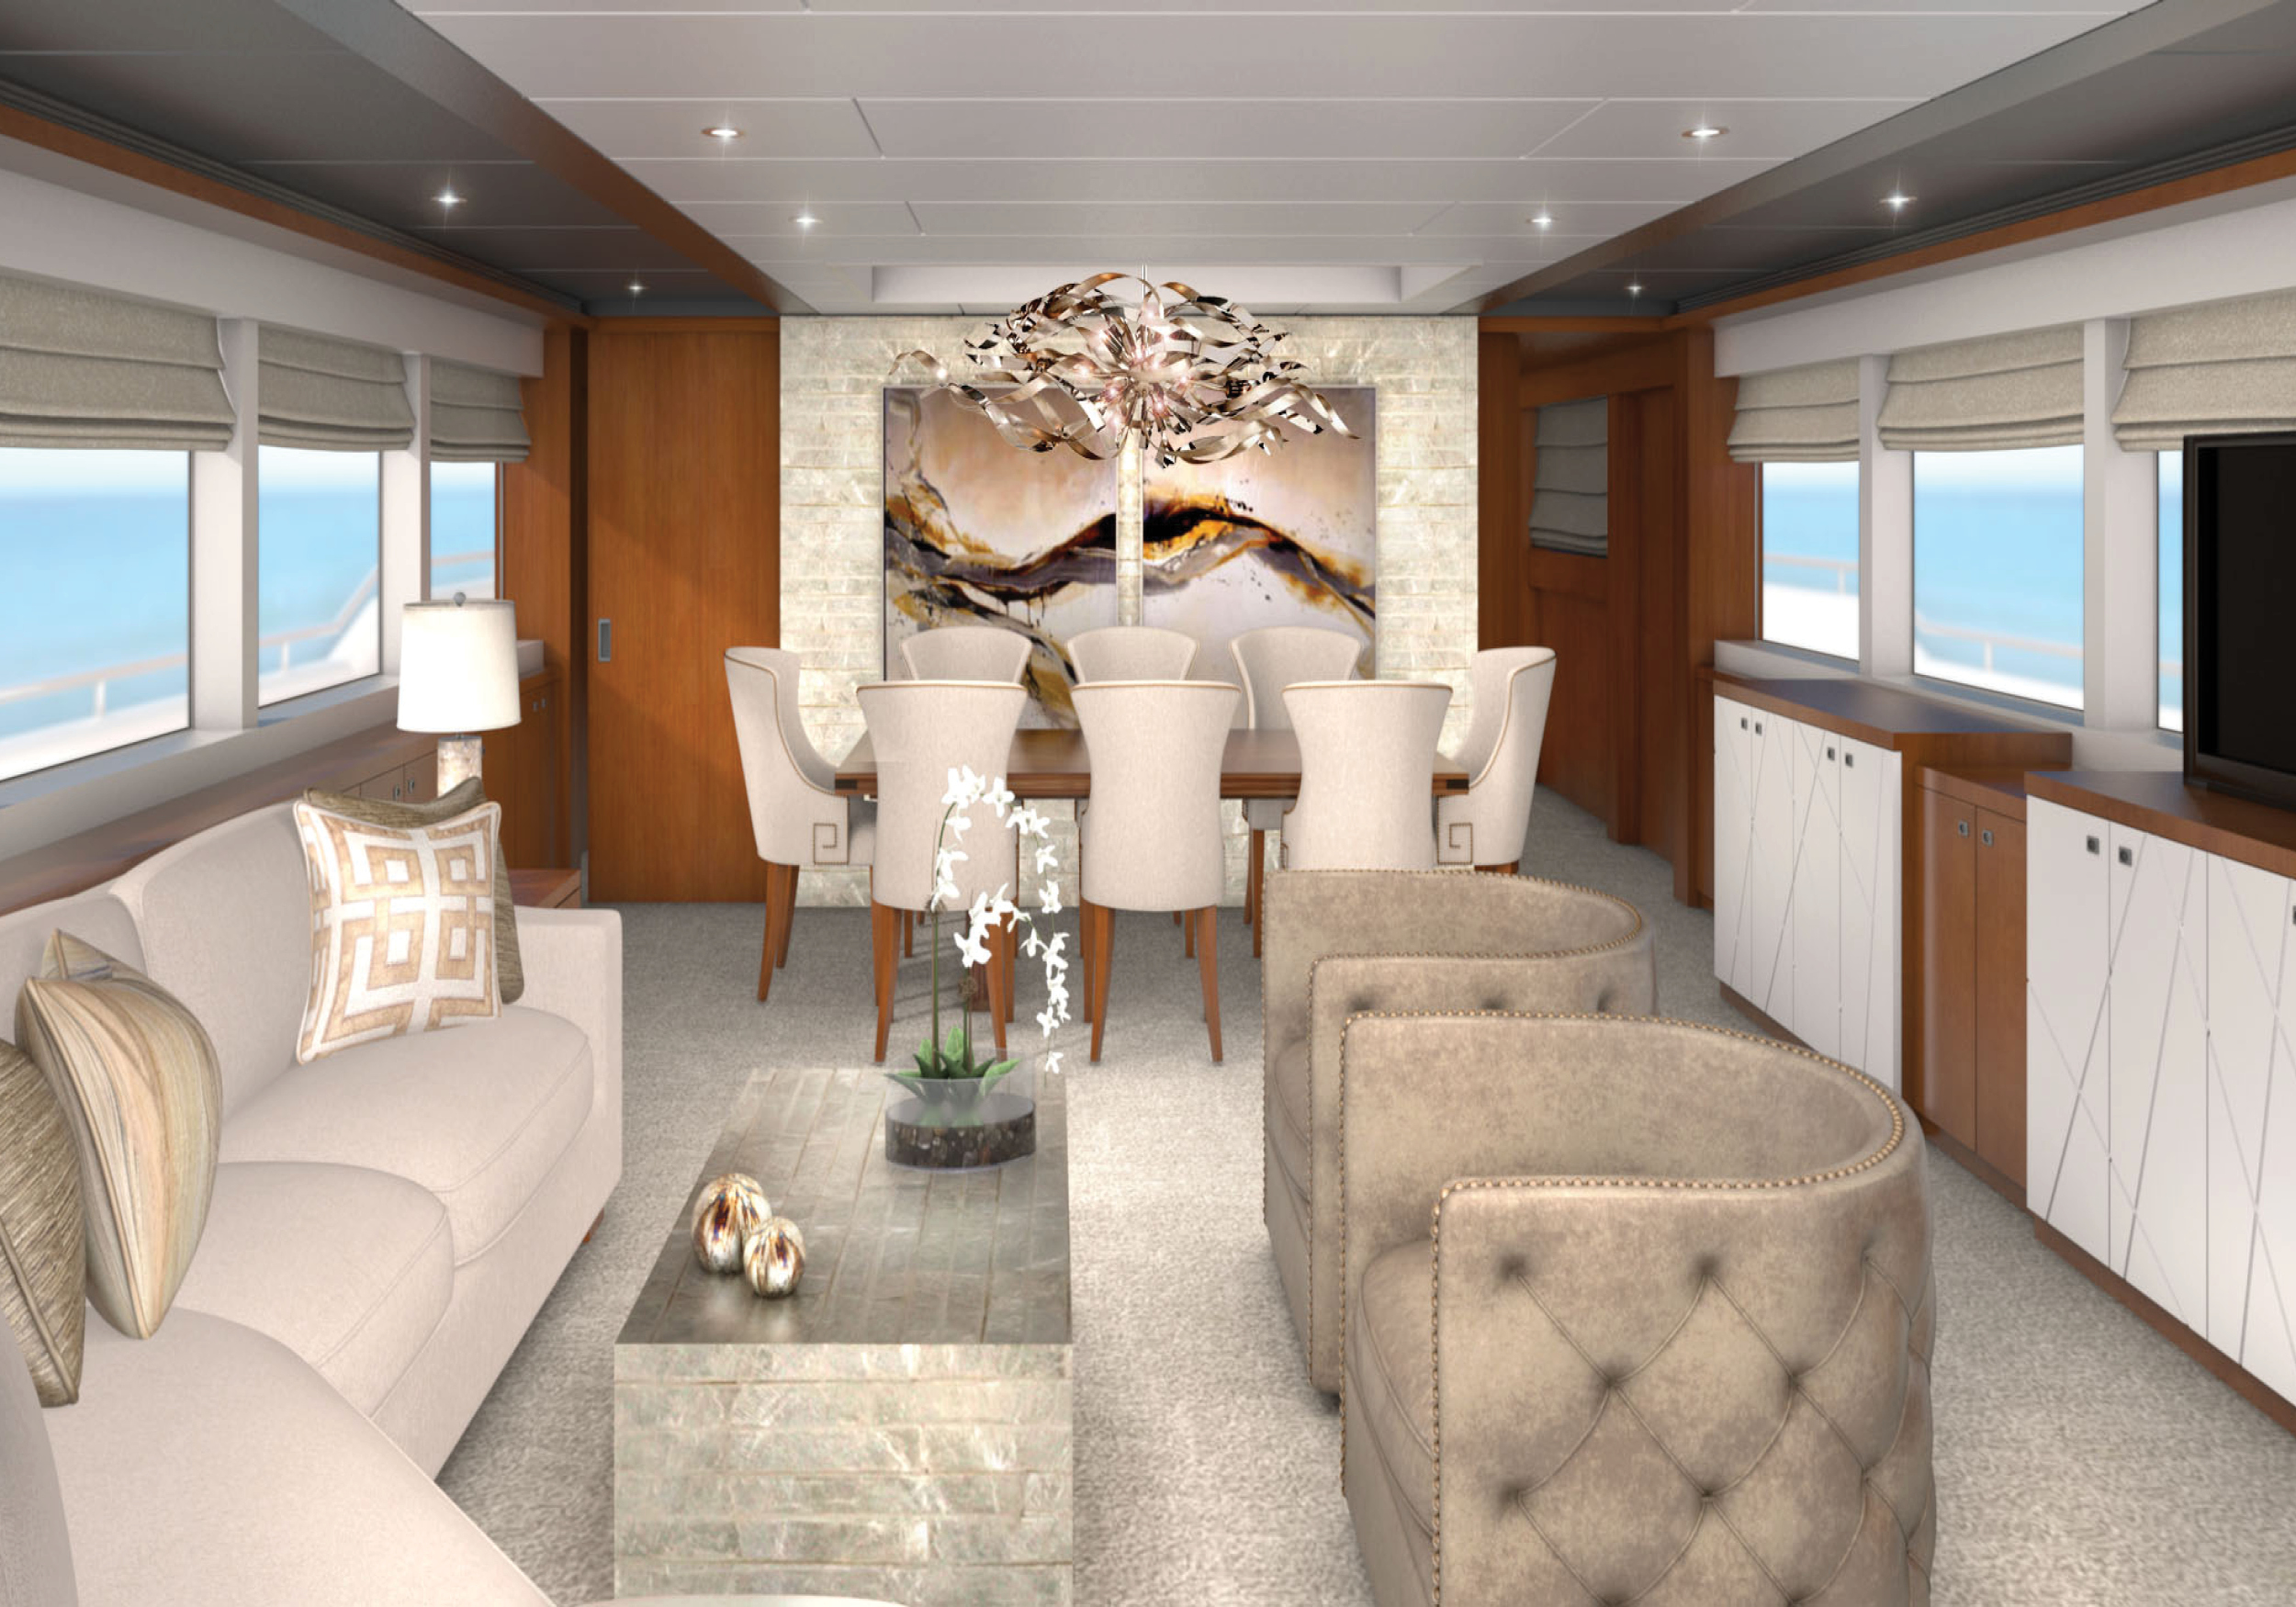 Karen-Lynn-Interior-Design-Yacht-Johnson93-5.jpg